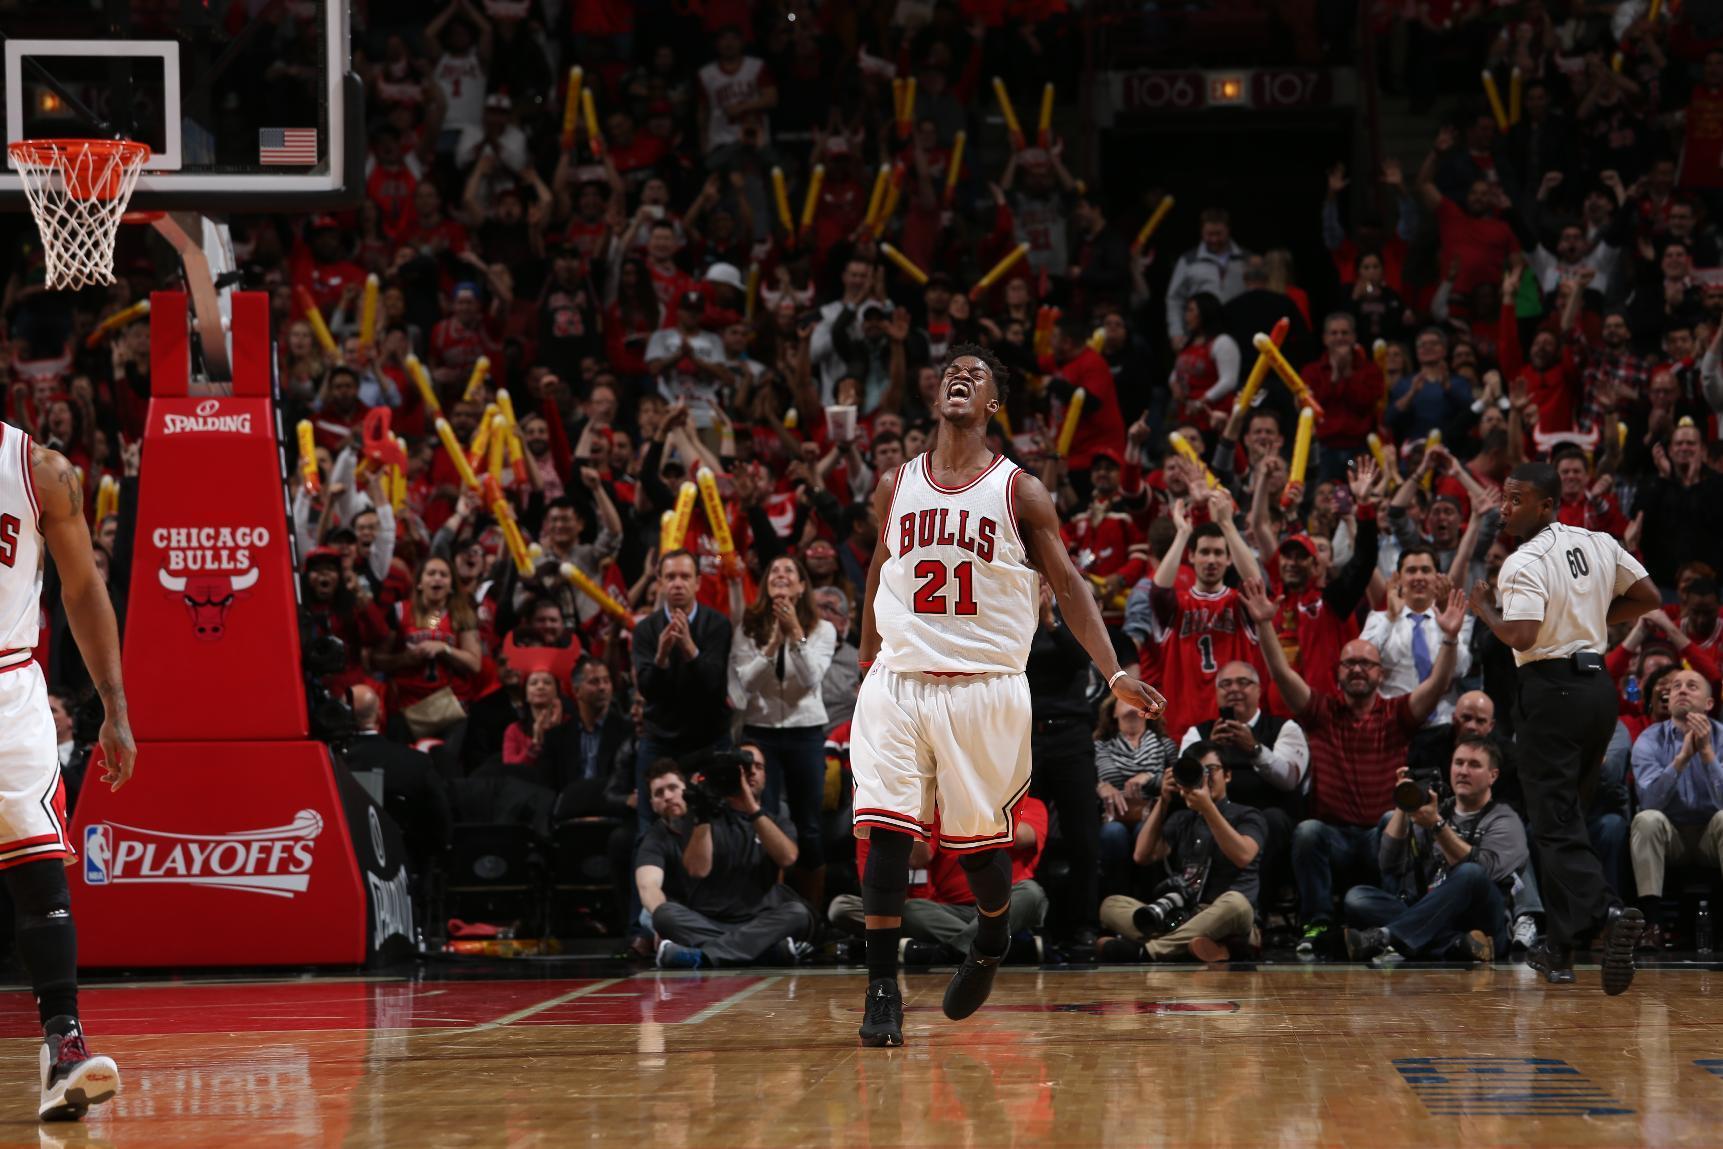 Butler scores 31, Bulls beat Bucks 91-82 to go up 2-0